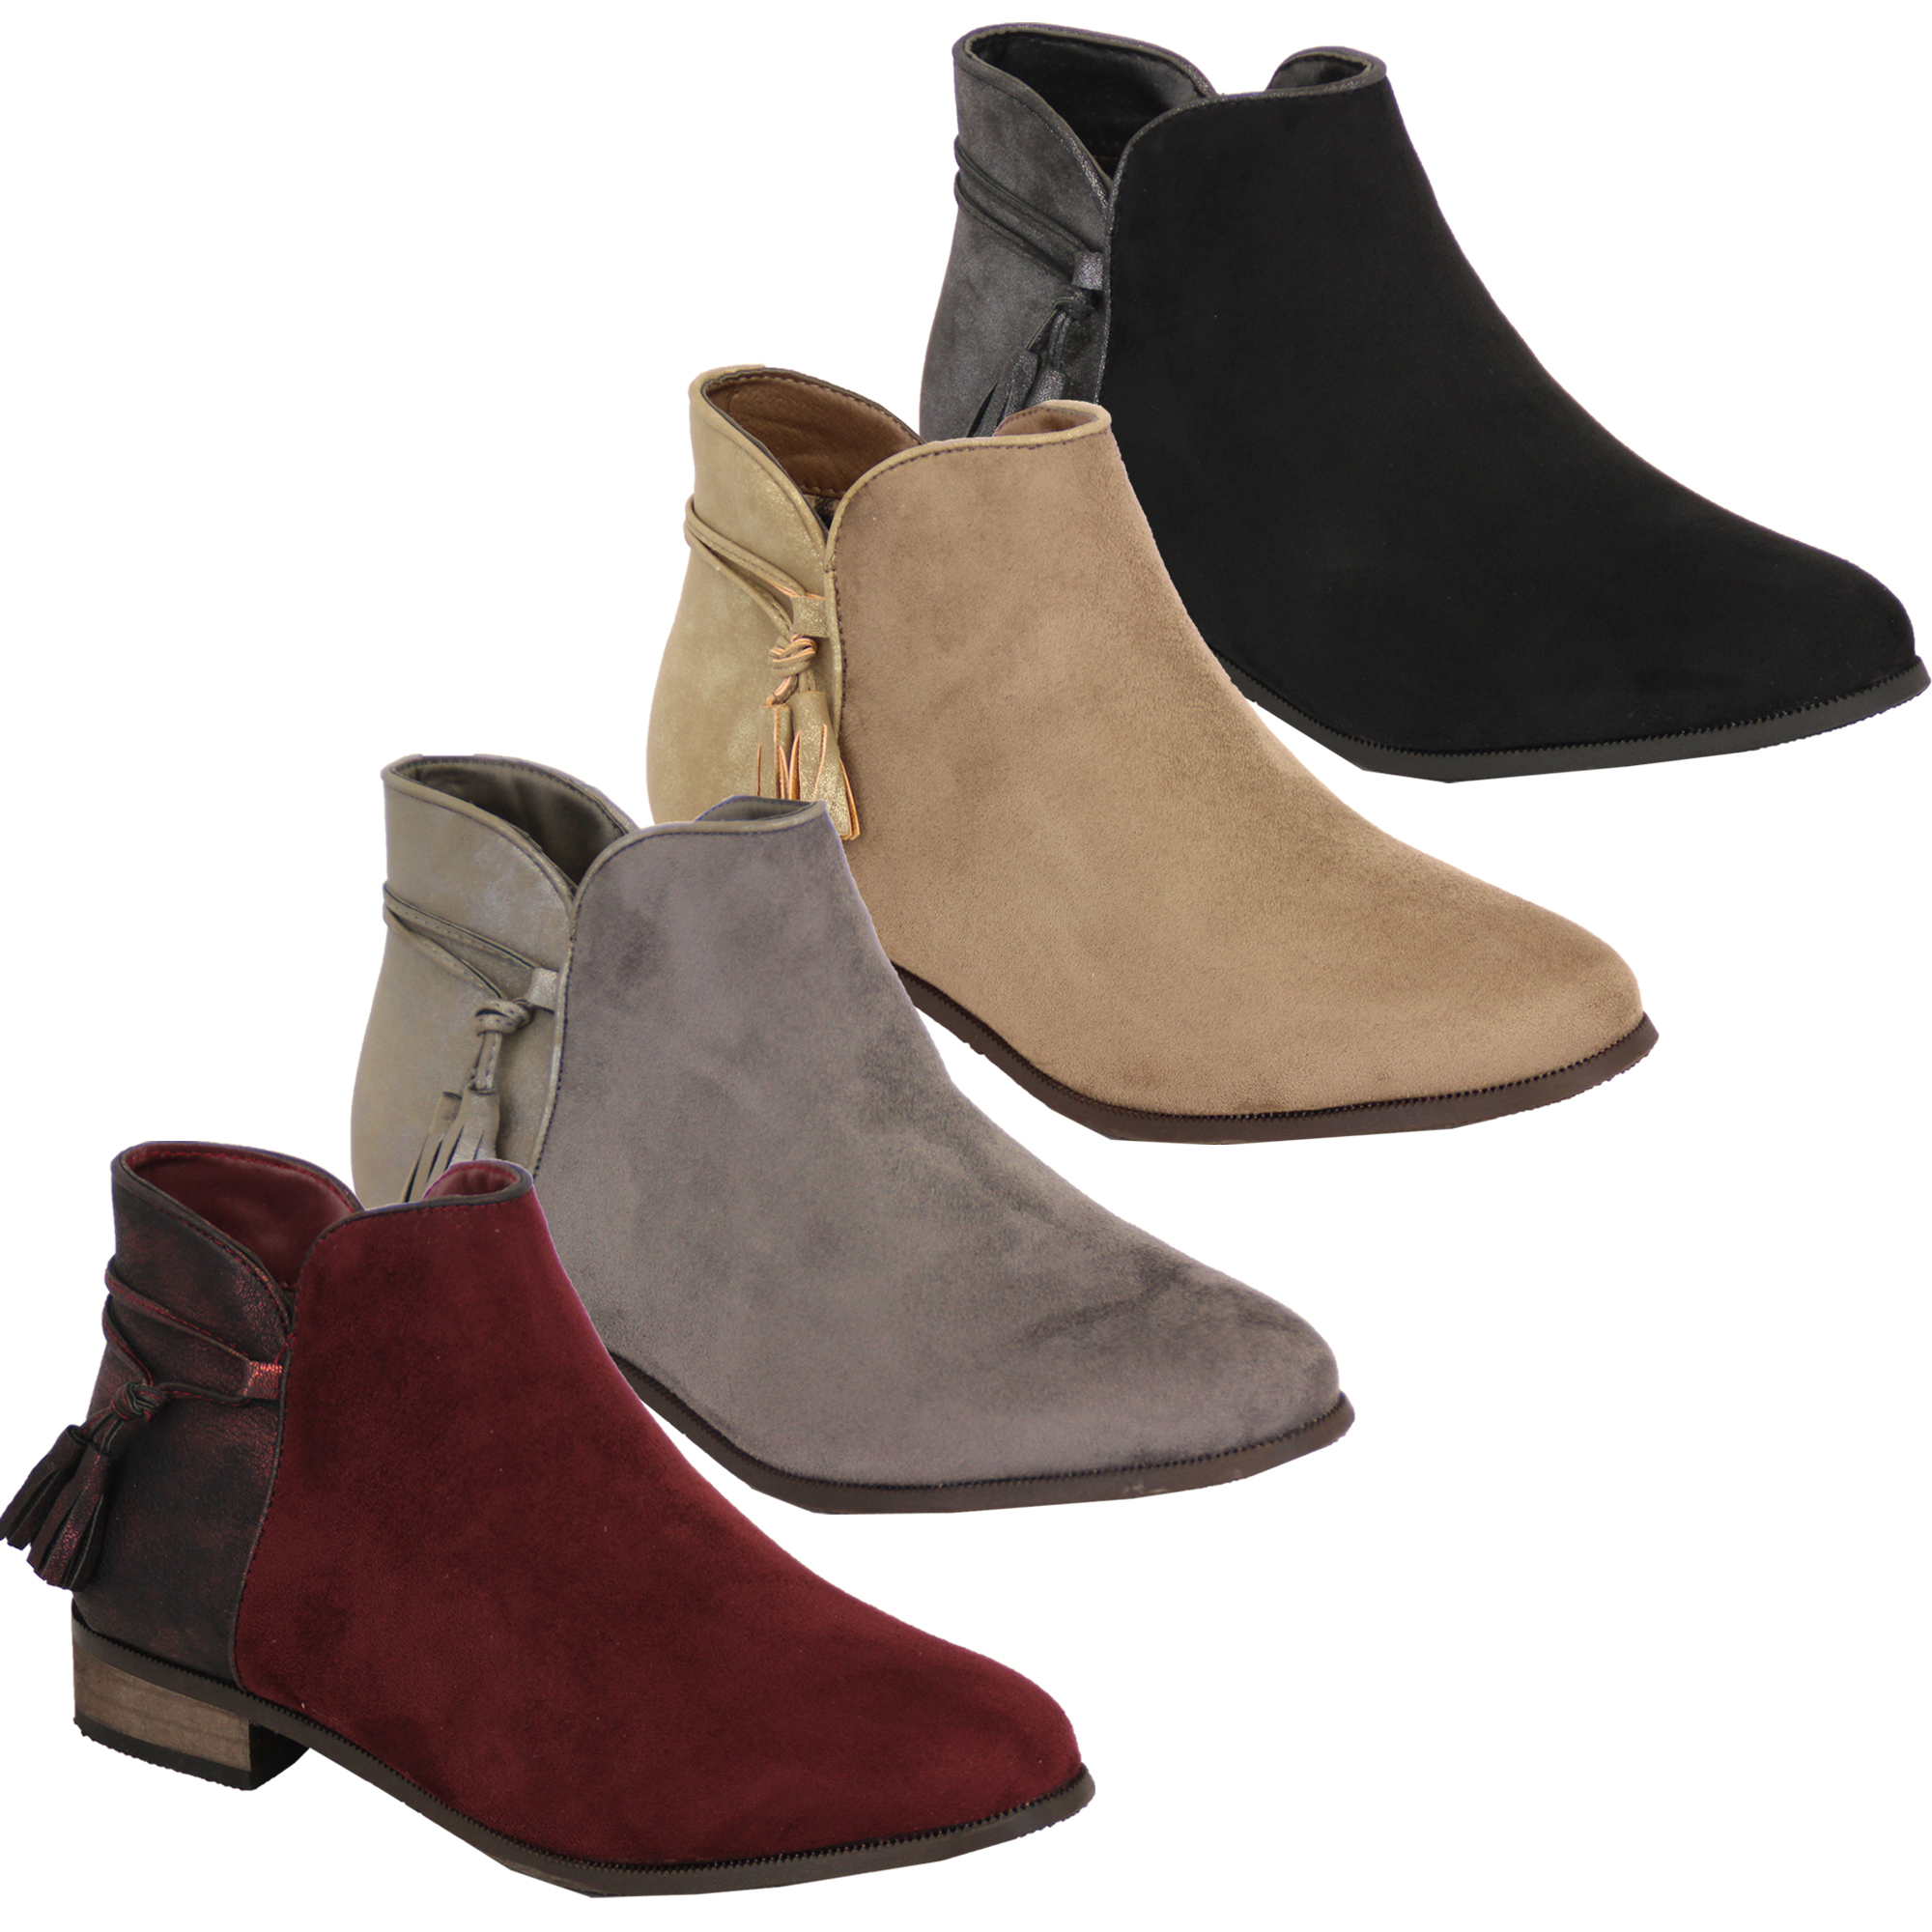 Ladies Chelsea Boots Womens Suede Look Shoes Ankle Zip Tassel Low ... 15f6c69673f8